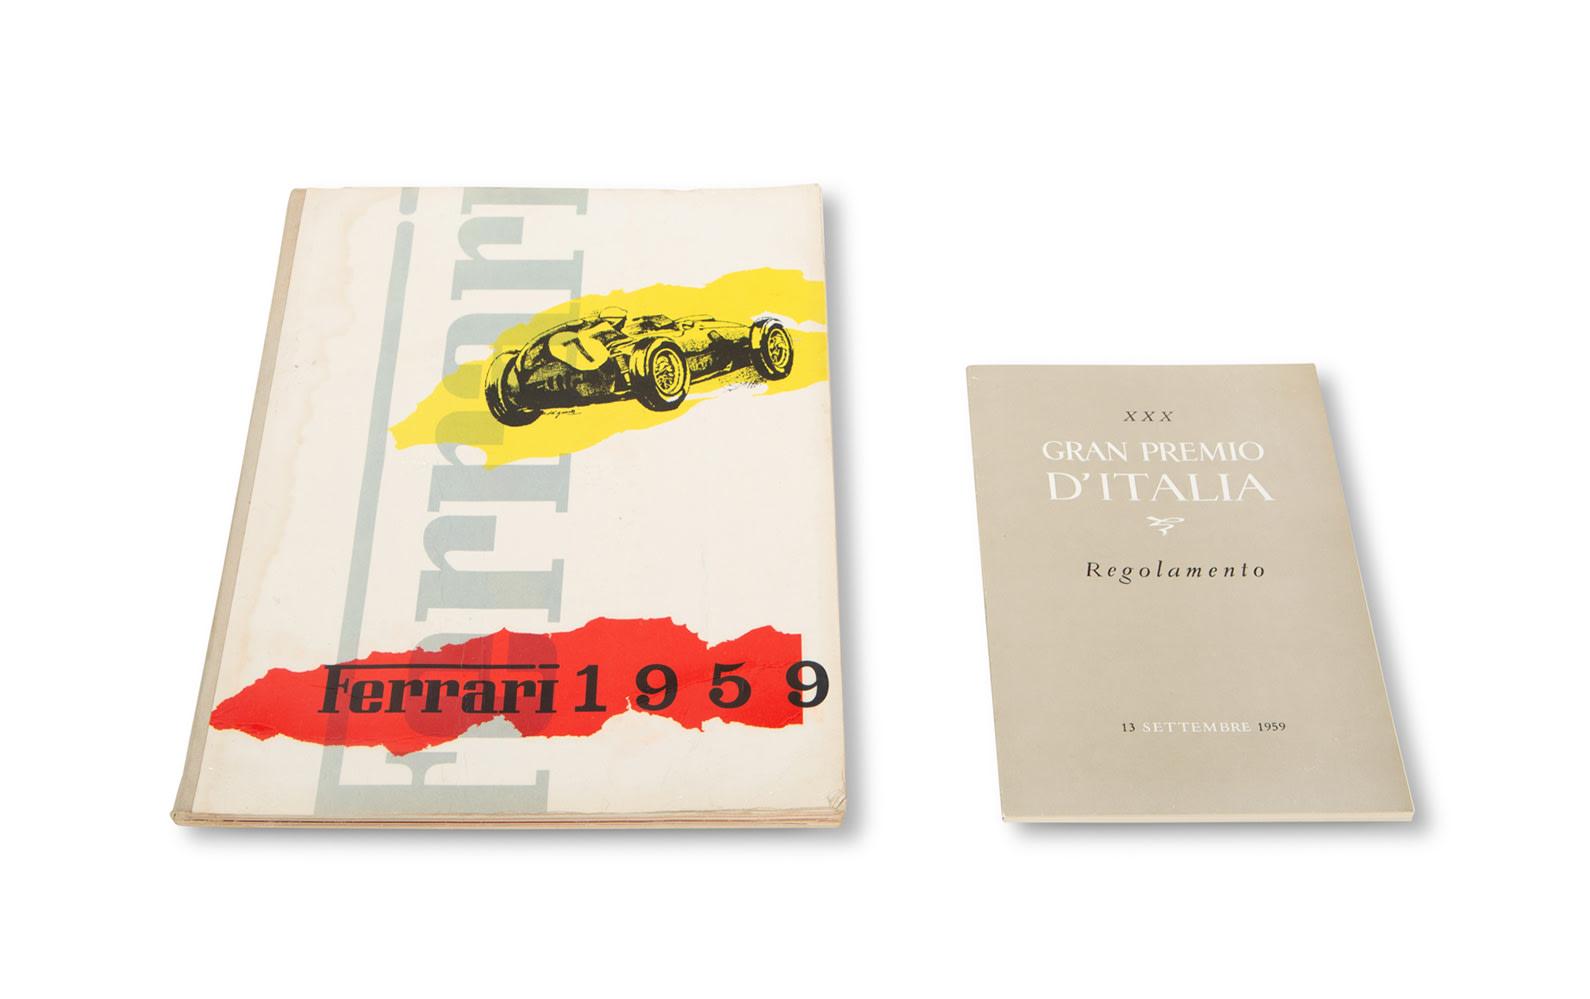 1959 Ferrari Yearbook and Italian Grand Prix Regulation Book